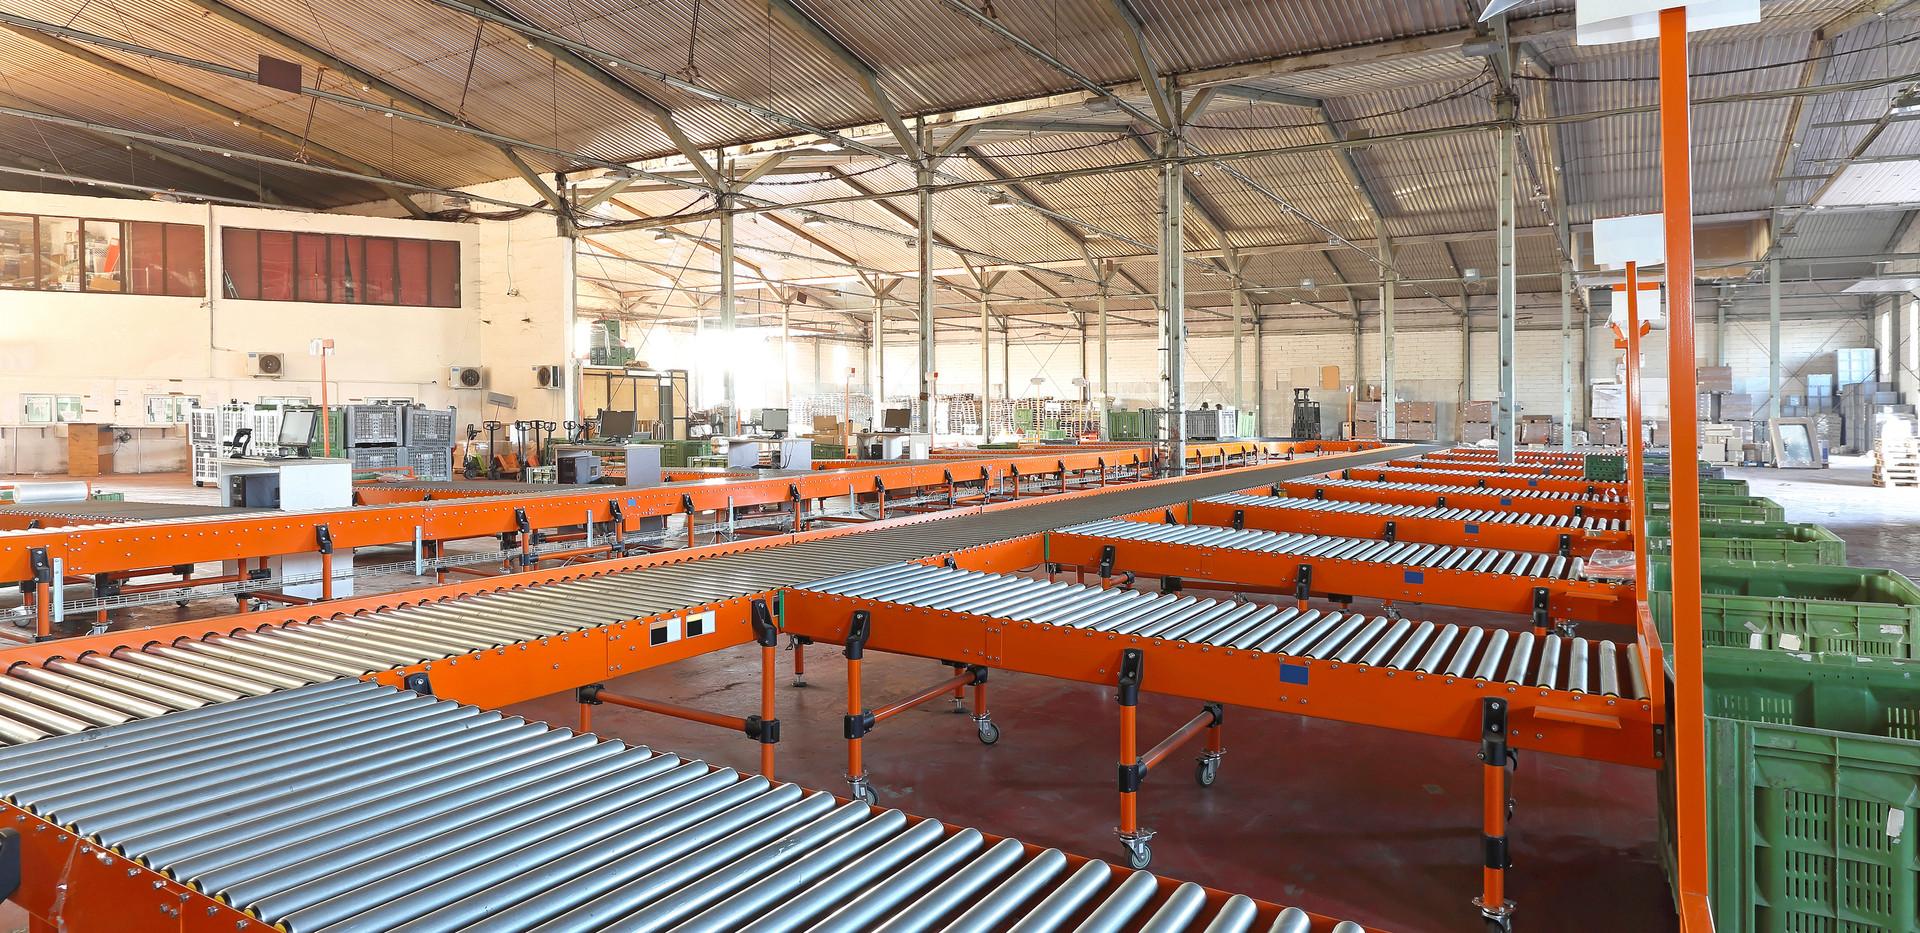 Roller Conveyors Warehouse